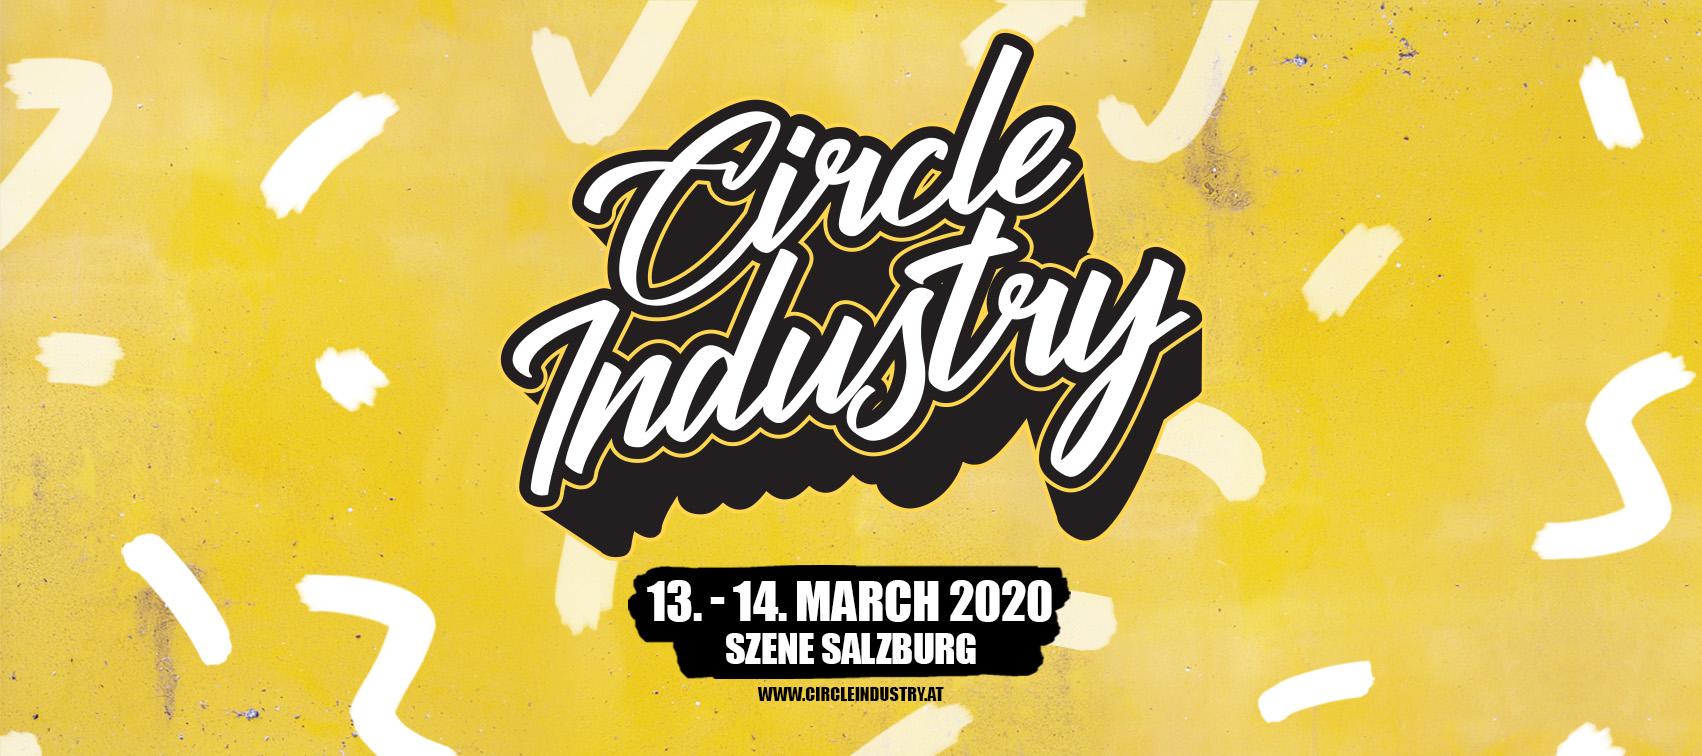 Circle Industry 2020 Finals Header